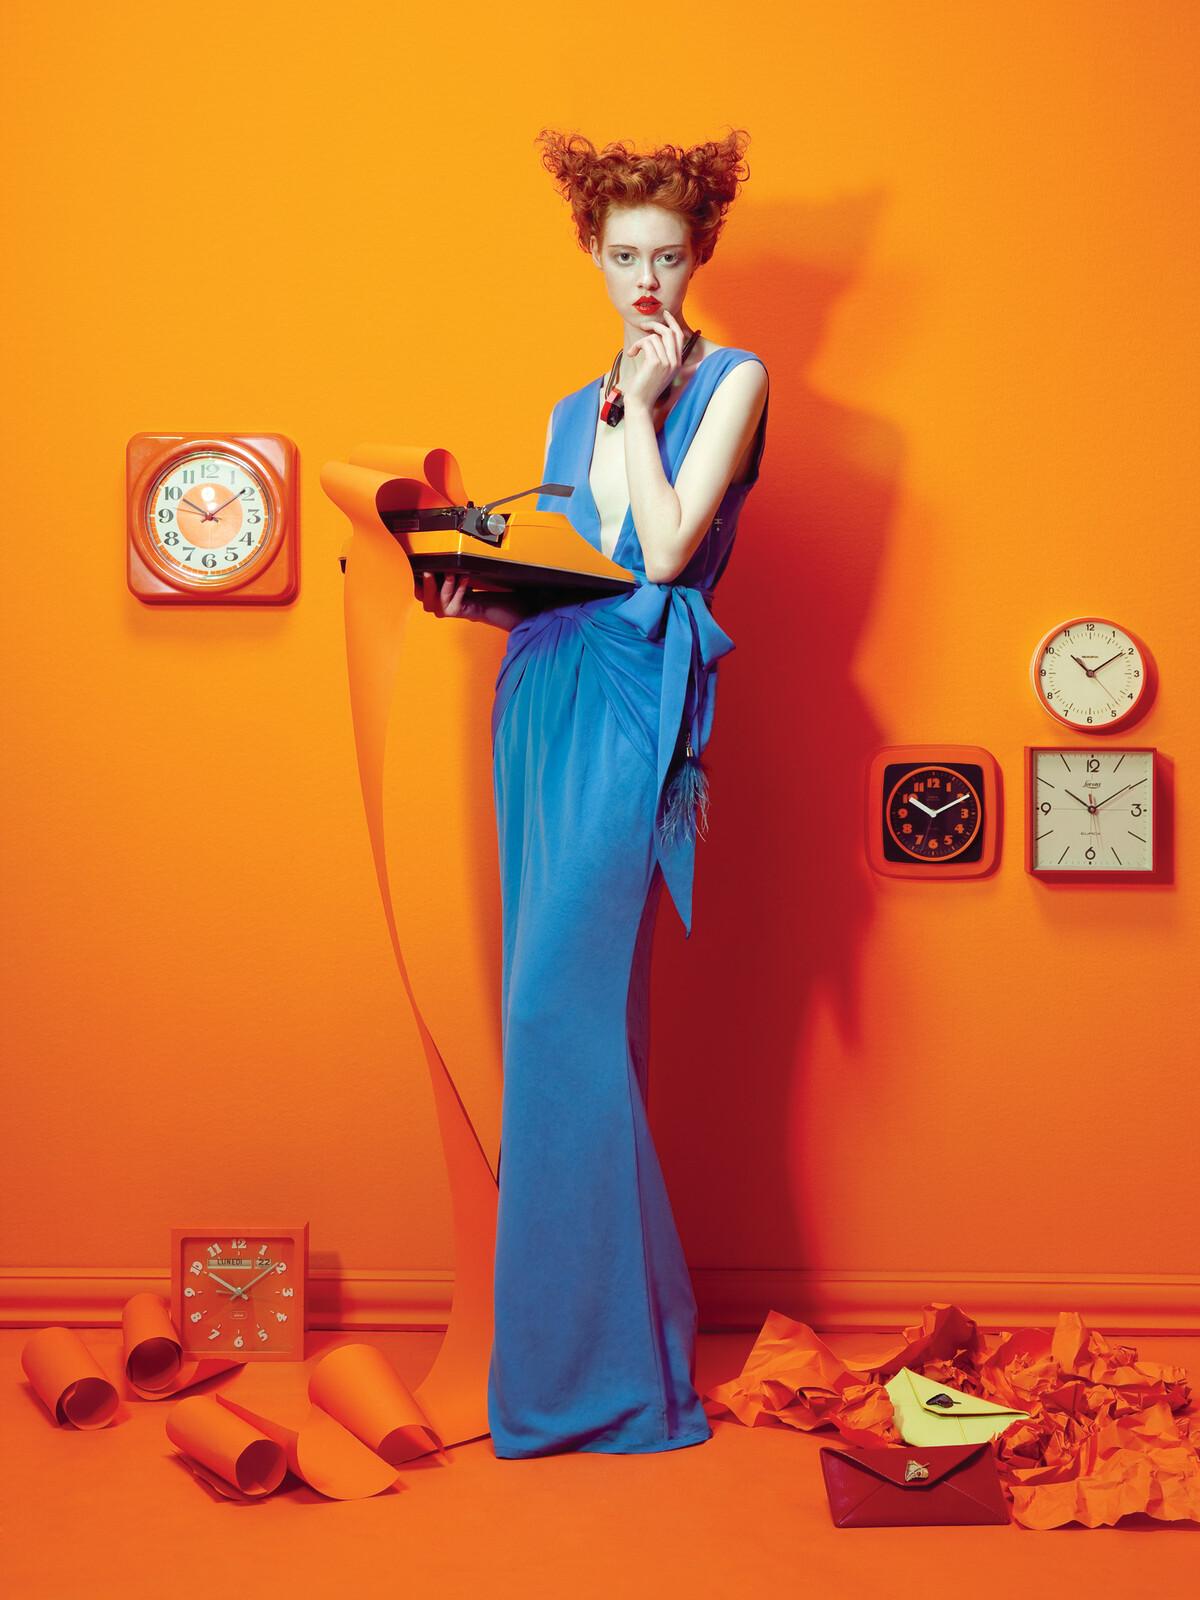 Killing Time I - Lucia Giacani | Trunk Archive